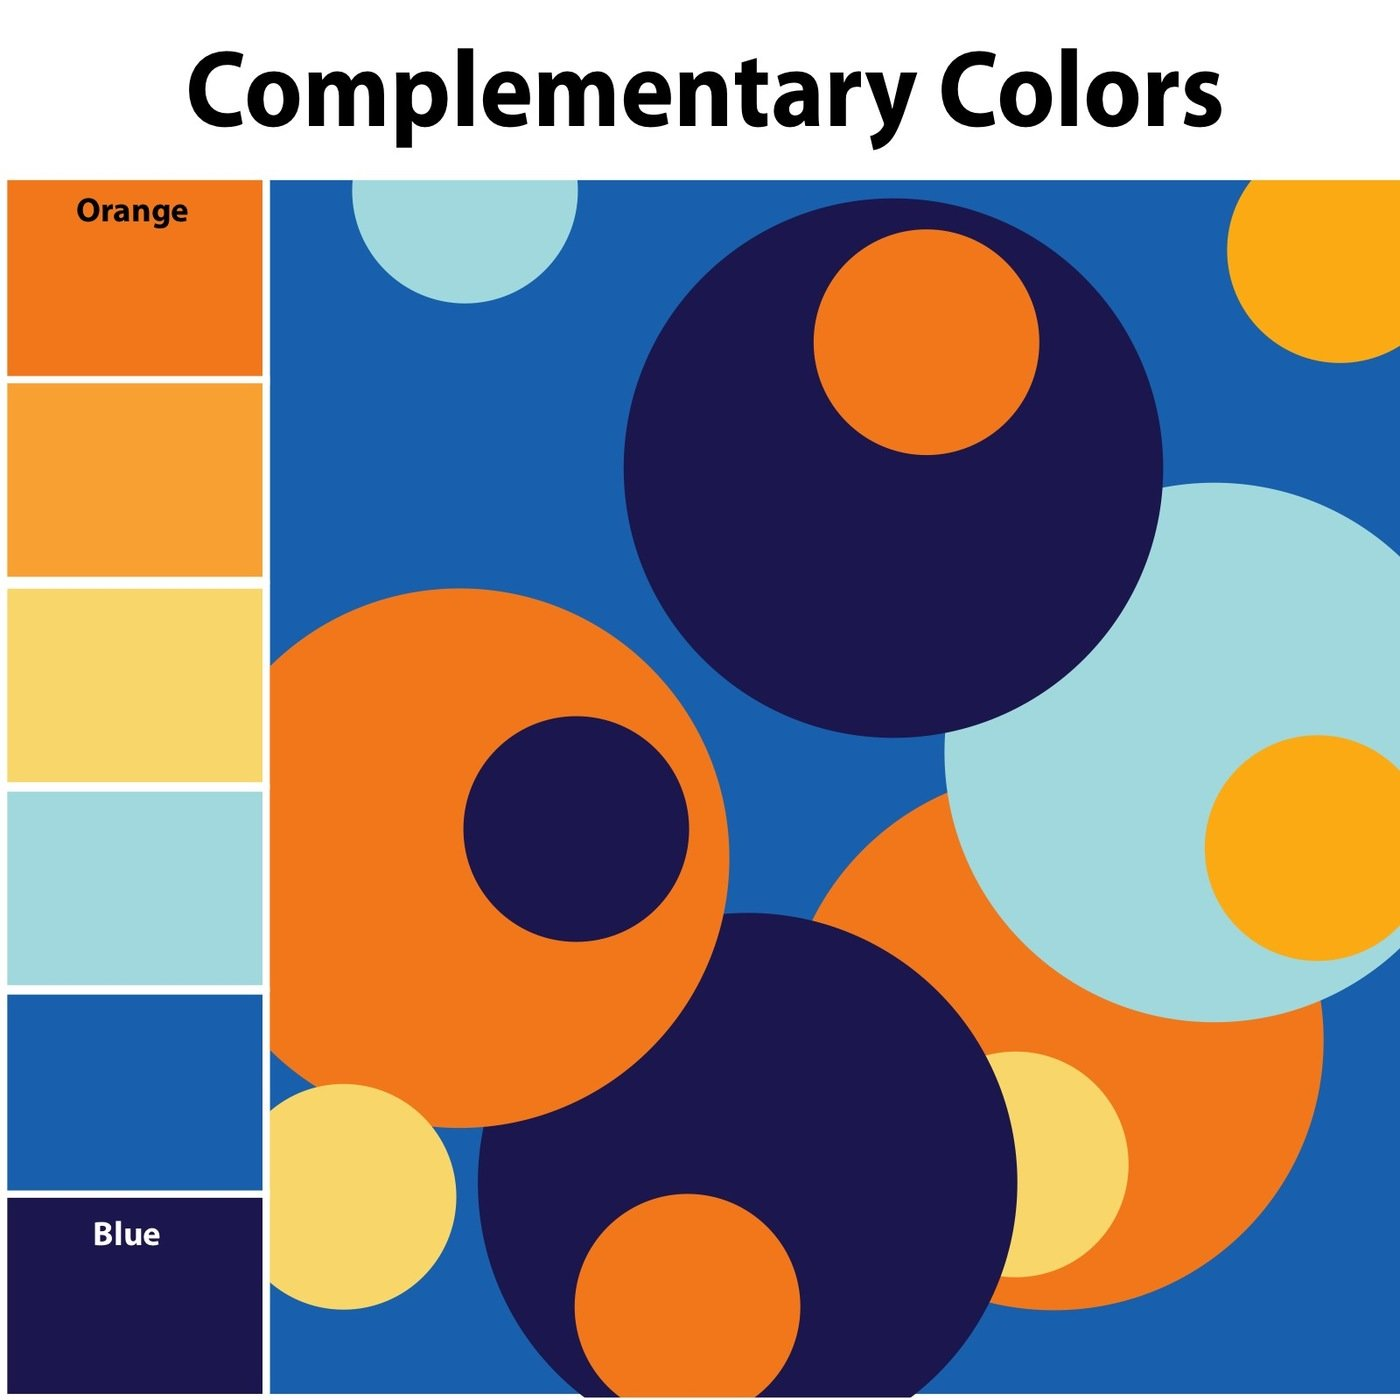 Color Exploration By Jill Leak At Coroflot.com